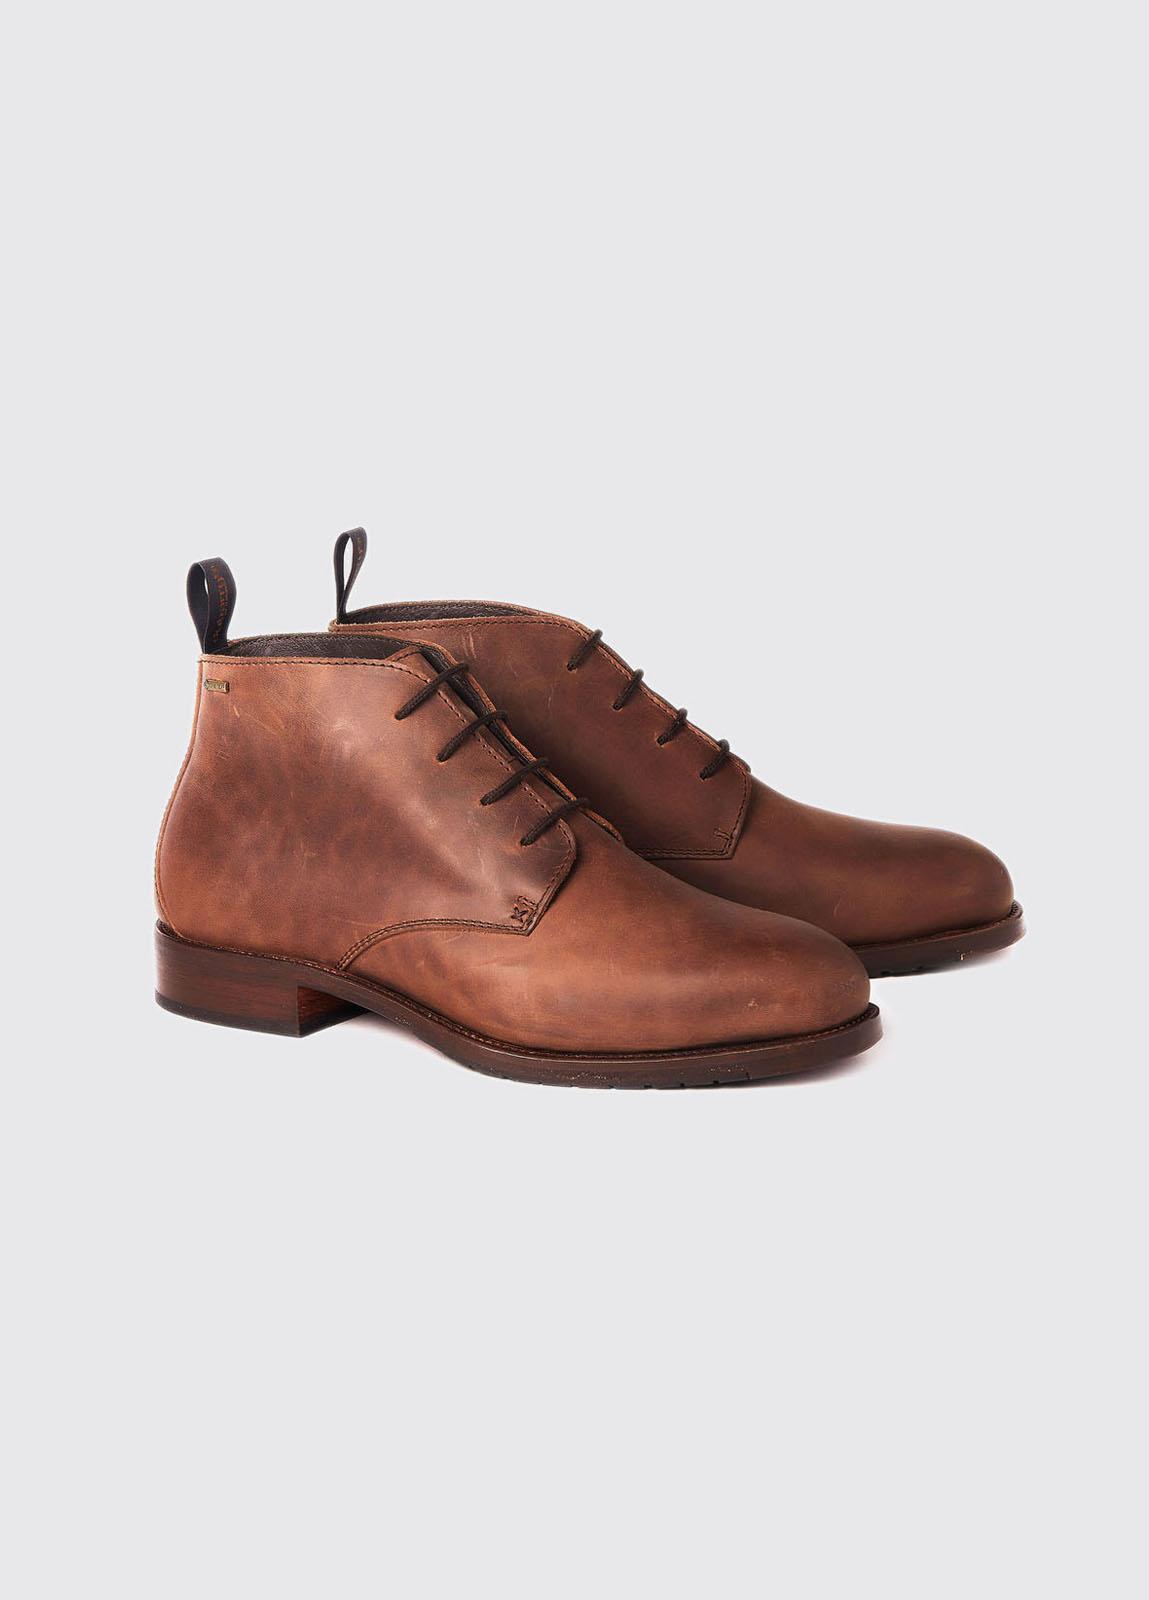 Kilgarvan Lace-up Boot - Bourbon